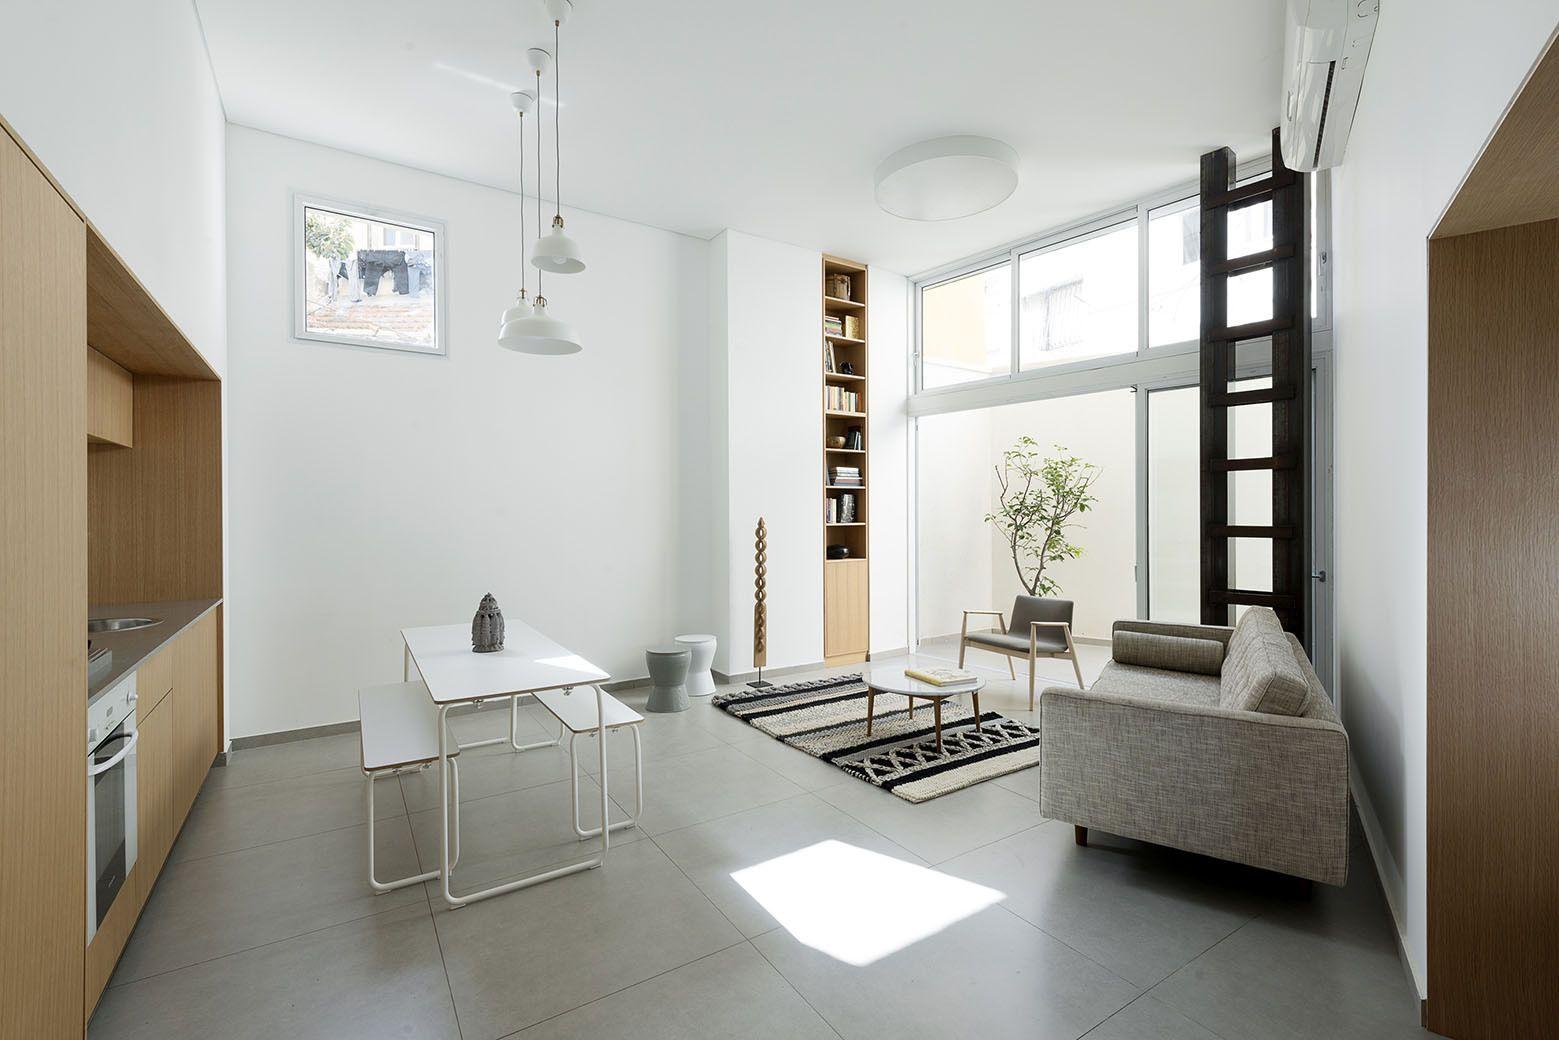 Jaffa Garden Apartment / Itai Palti